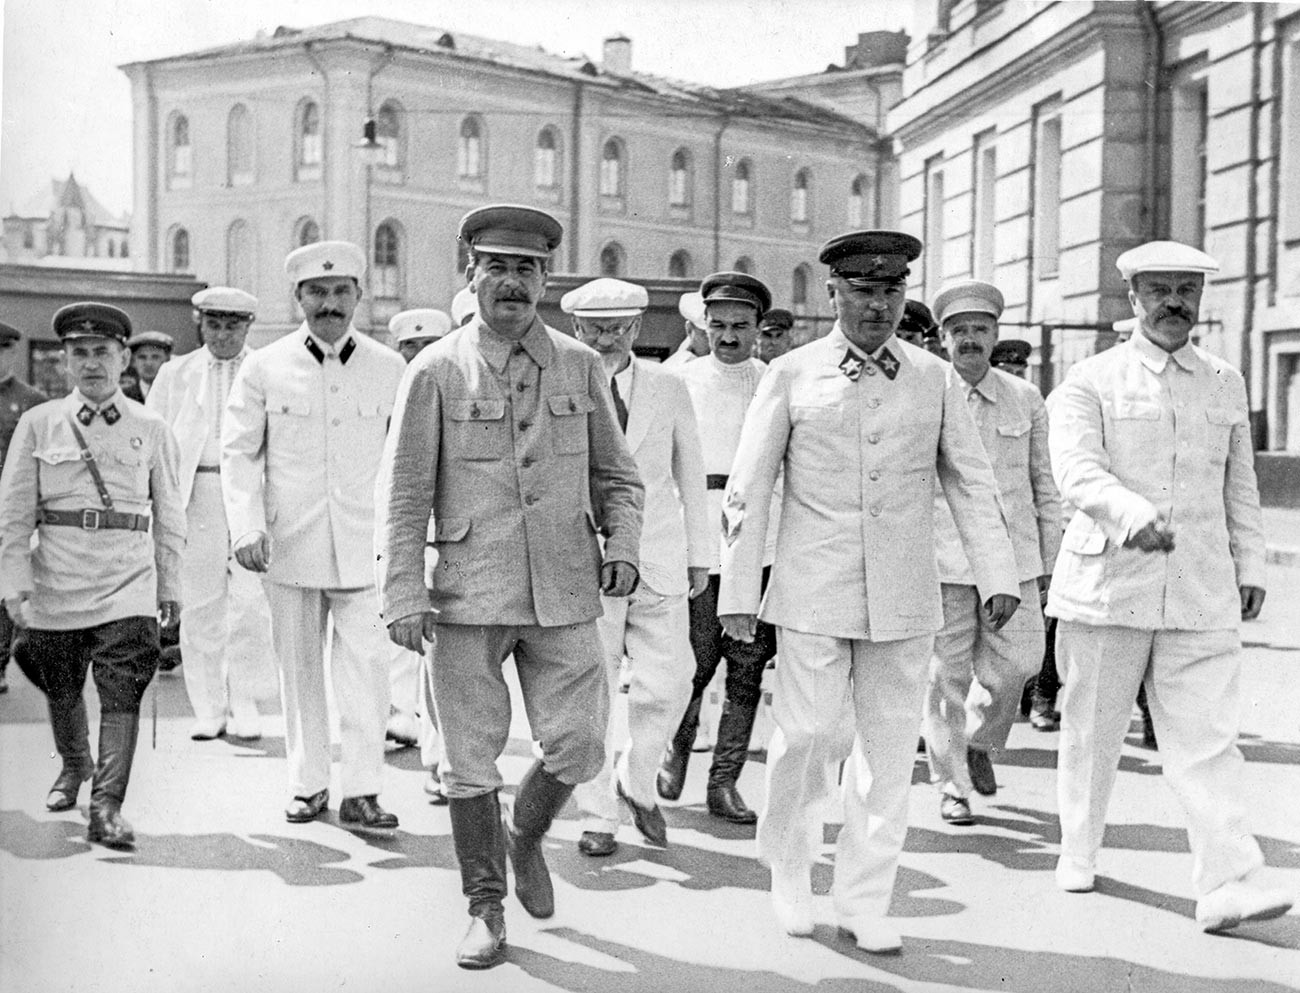 Во время парада в июле 1936 года.